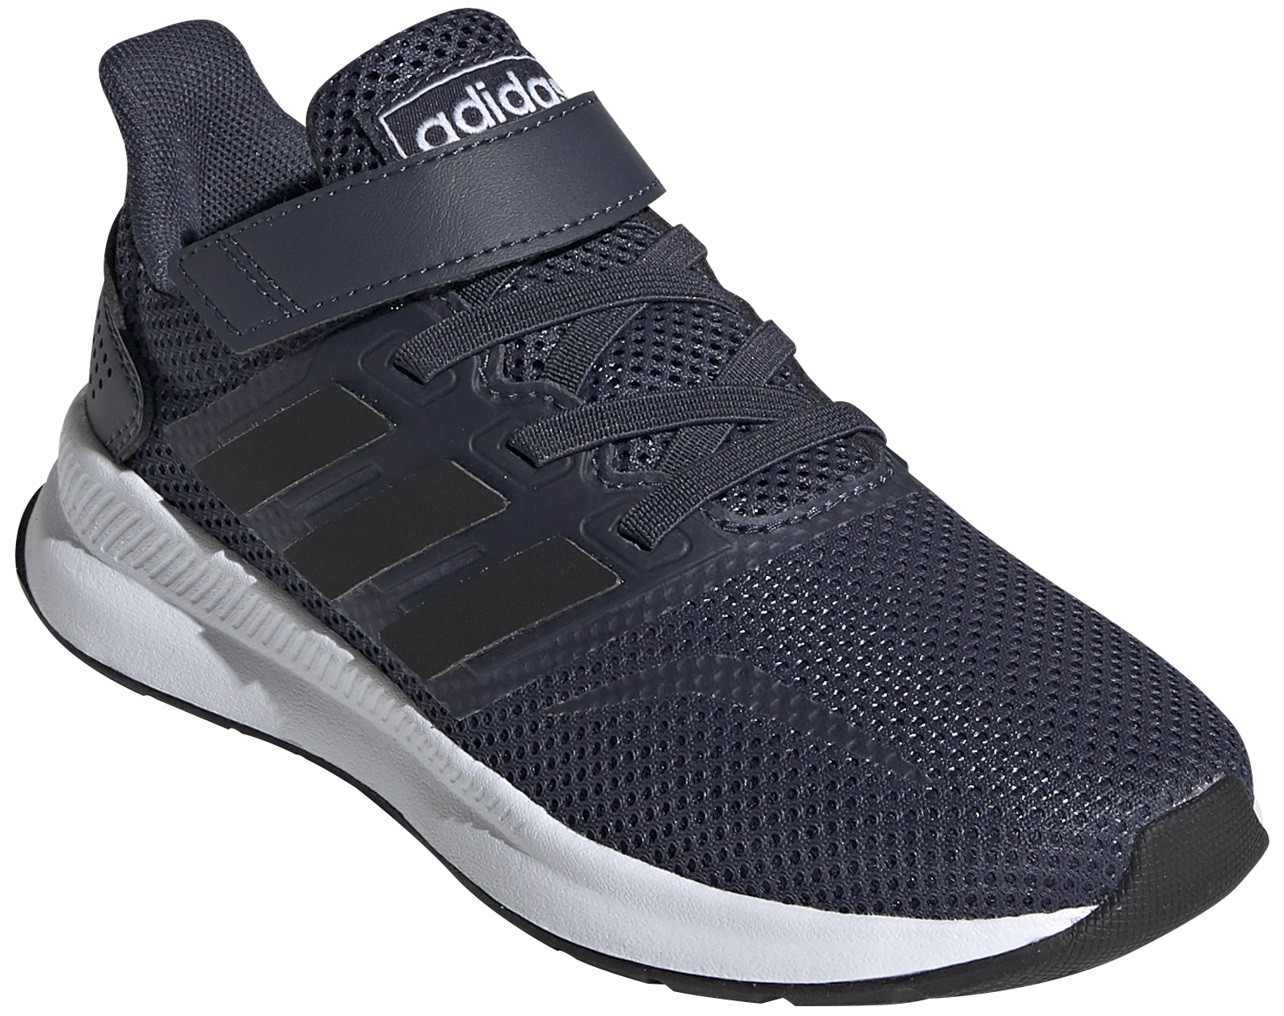 Skor adidas Runfalcon K F36549 CblackCblackCblack